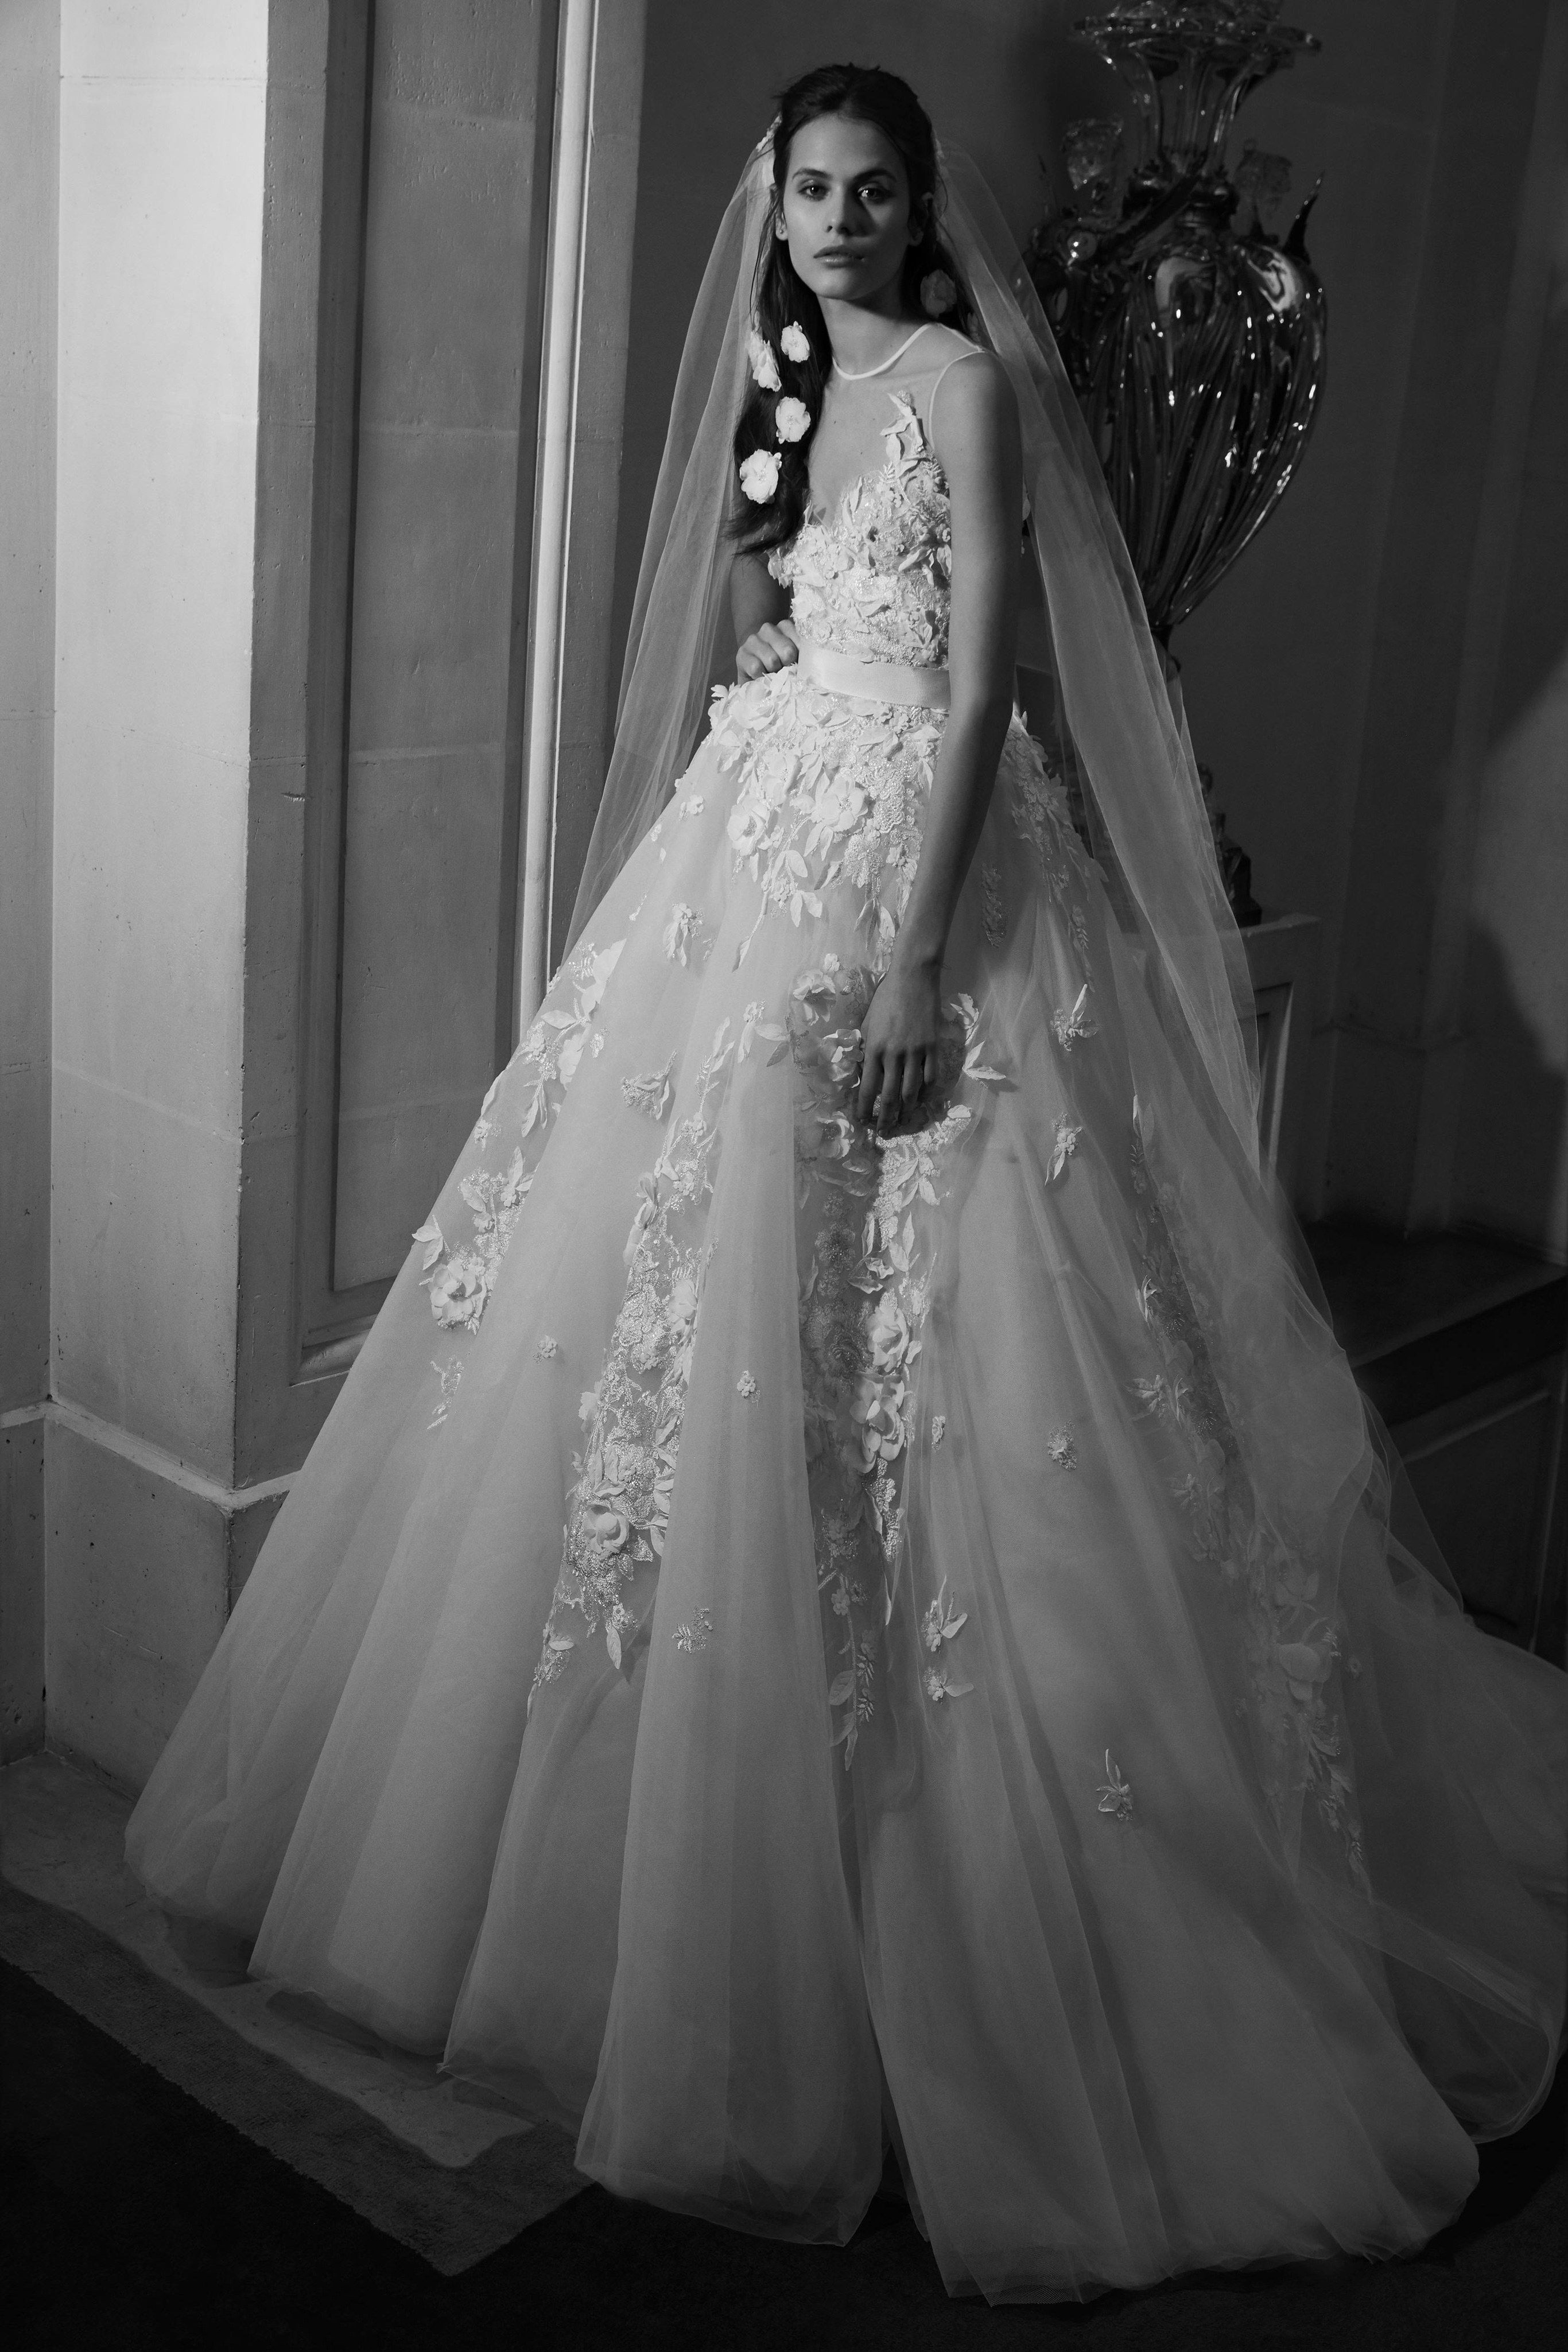 Ellie Saab Spring 2019 Bridal Collection - Wedding Dresses  weddingdress   bridalgown  weddinggown 684f55d46aea